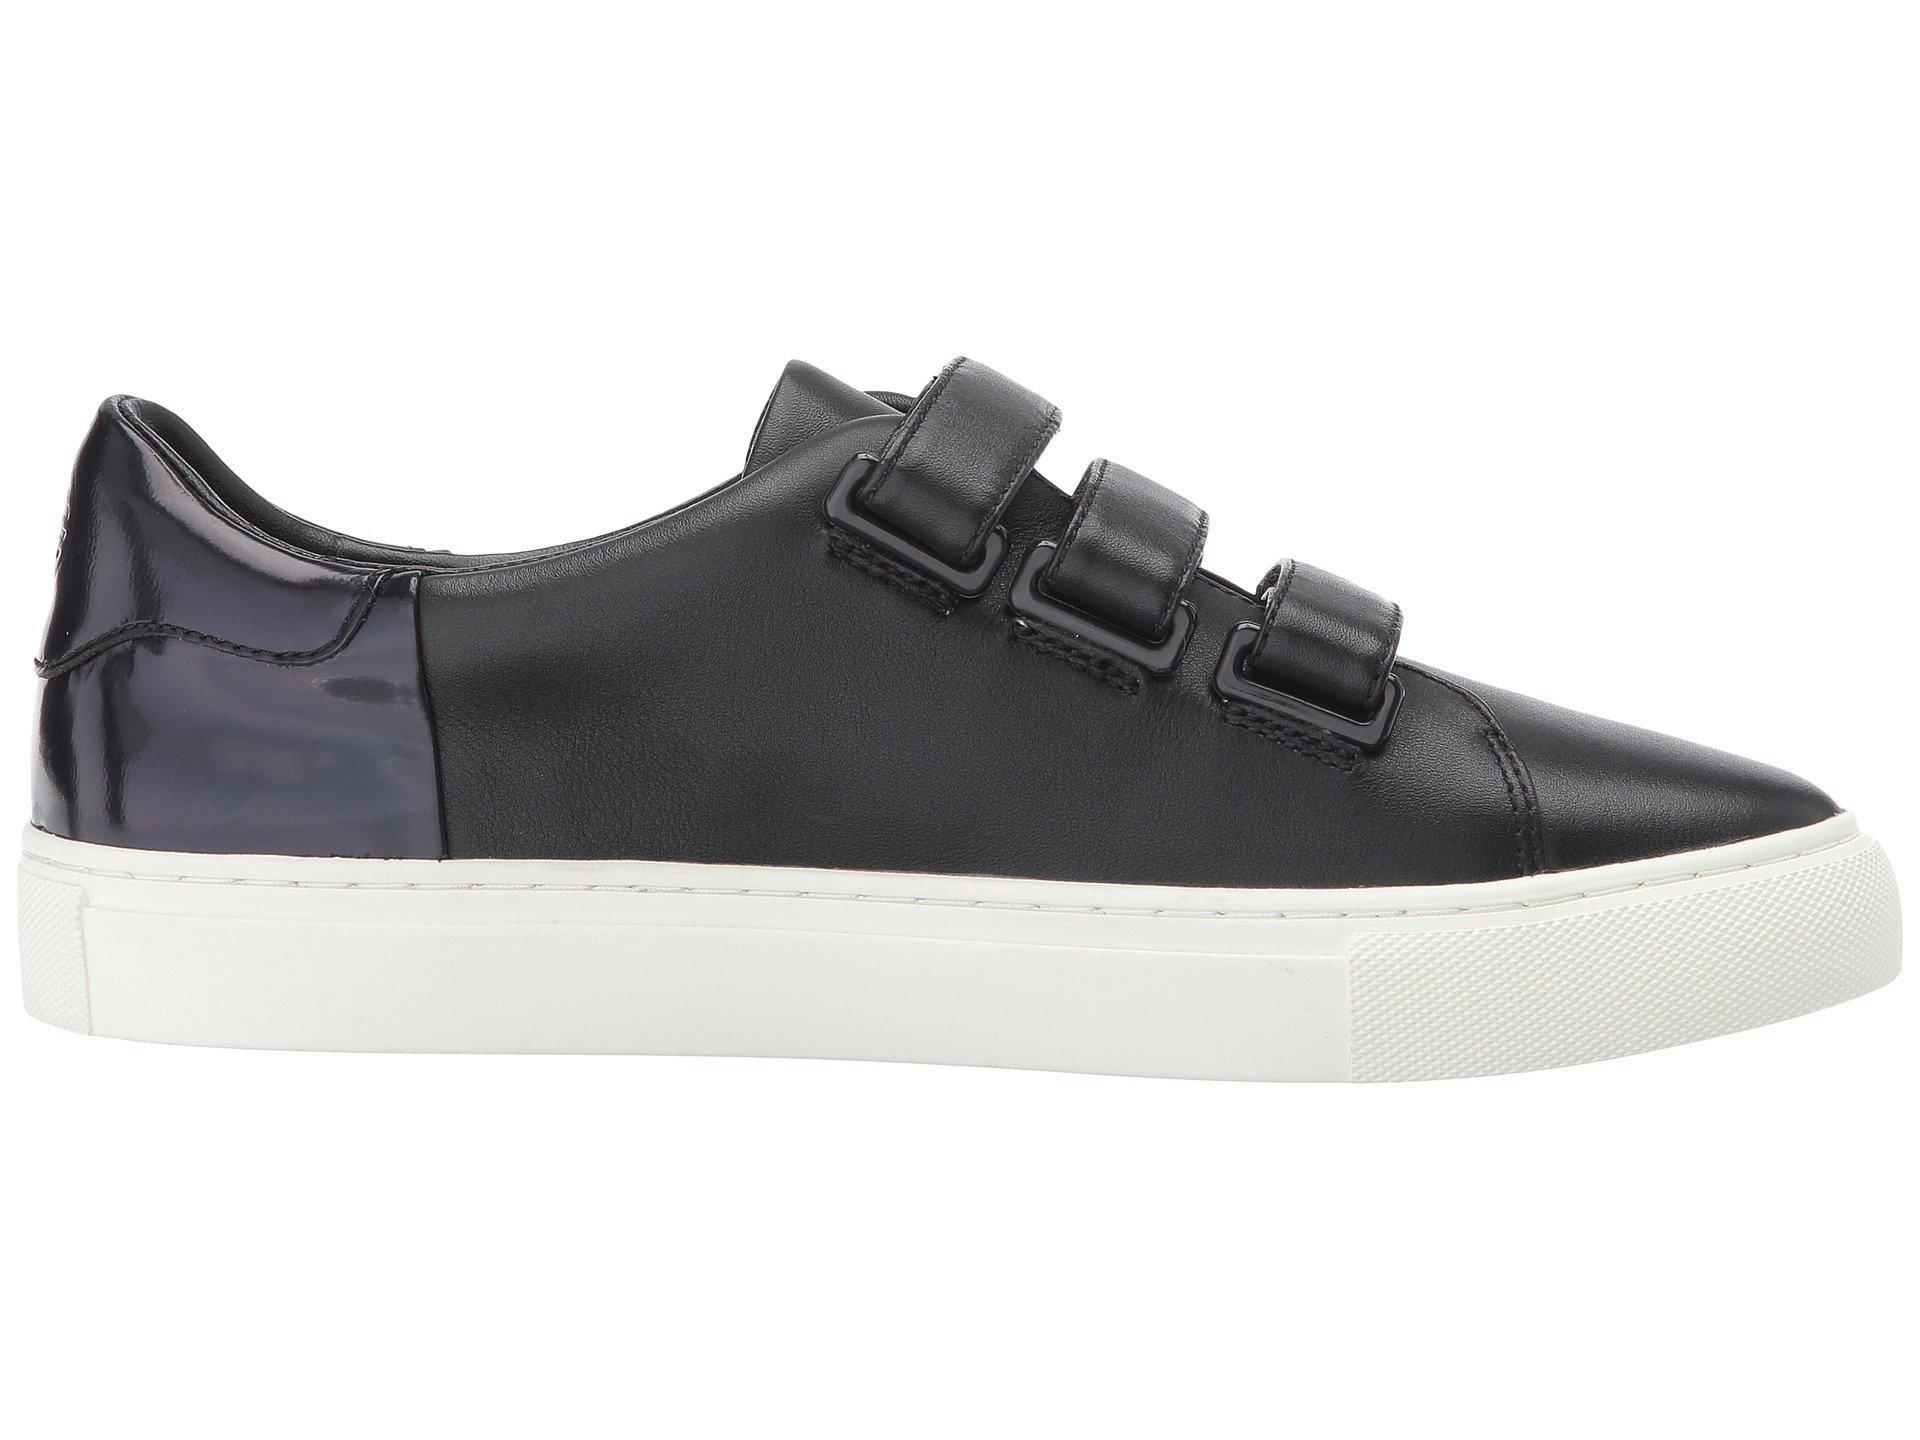 Lyst - Tory Sport Color Block Sneaker in Black